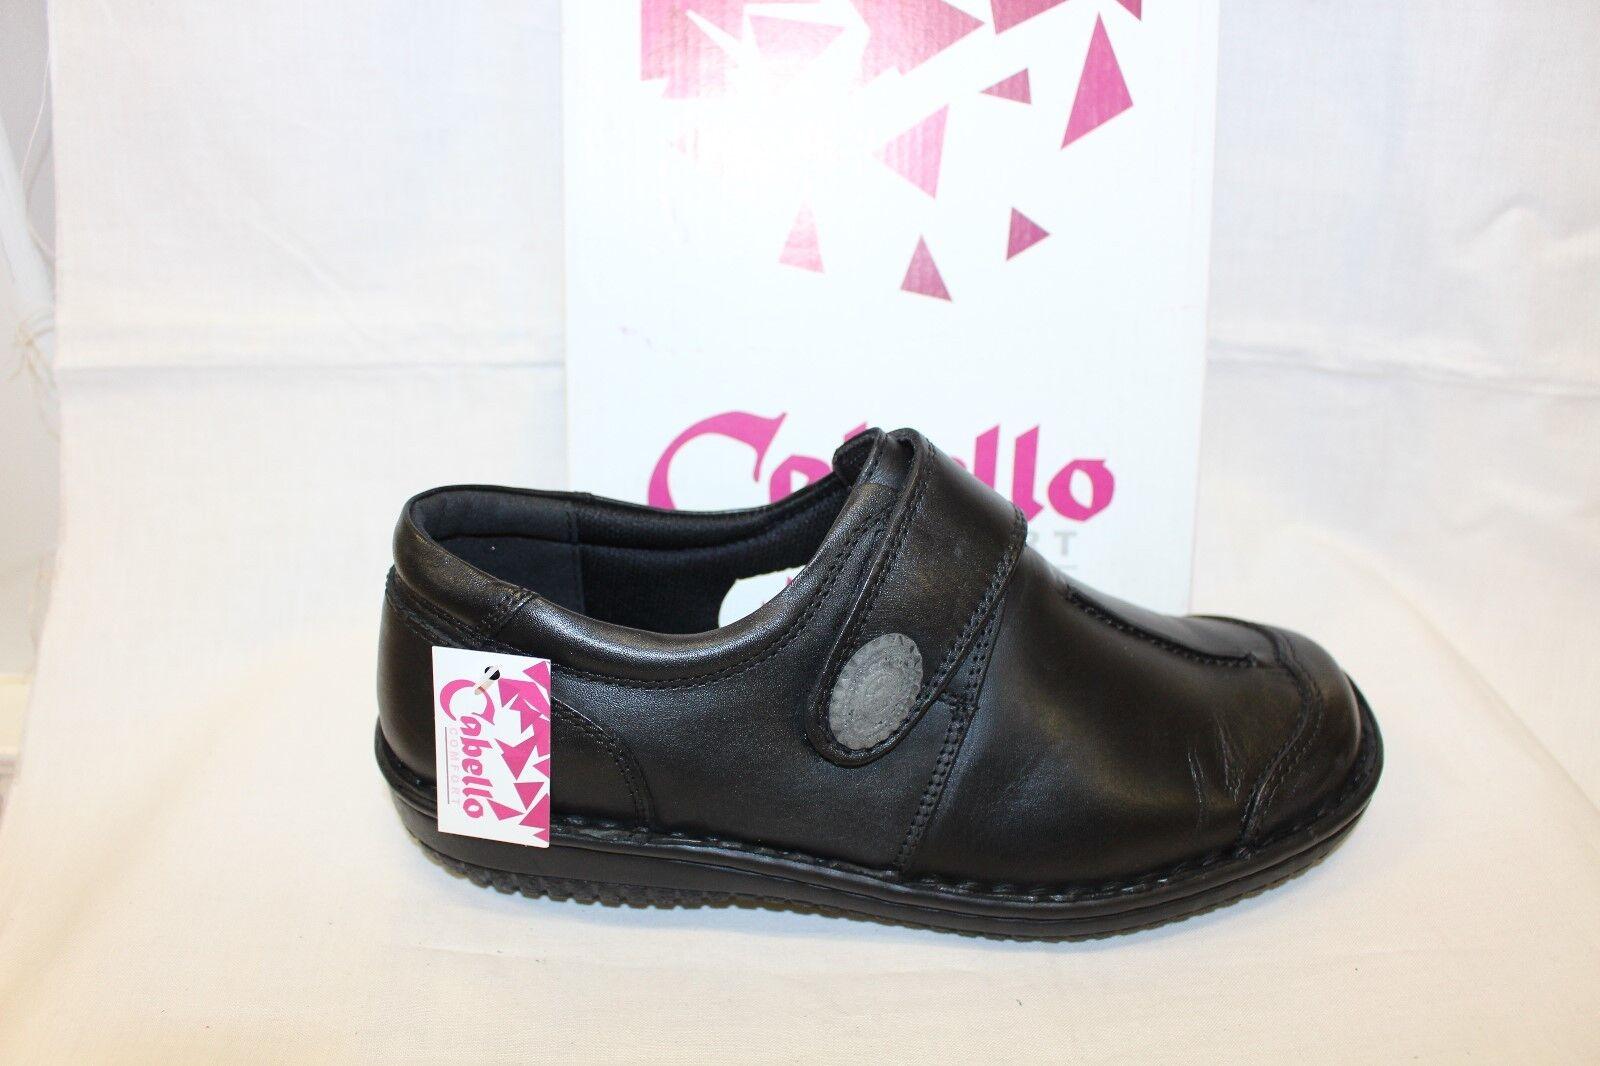 LADIES SHOES/FOOTWEAR - Cabello shoe 5072 black slip on